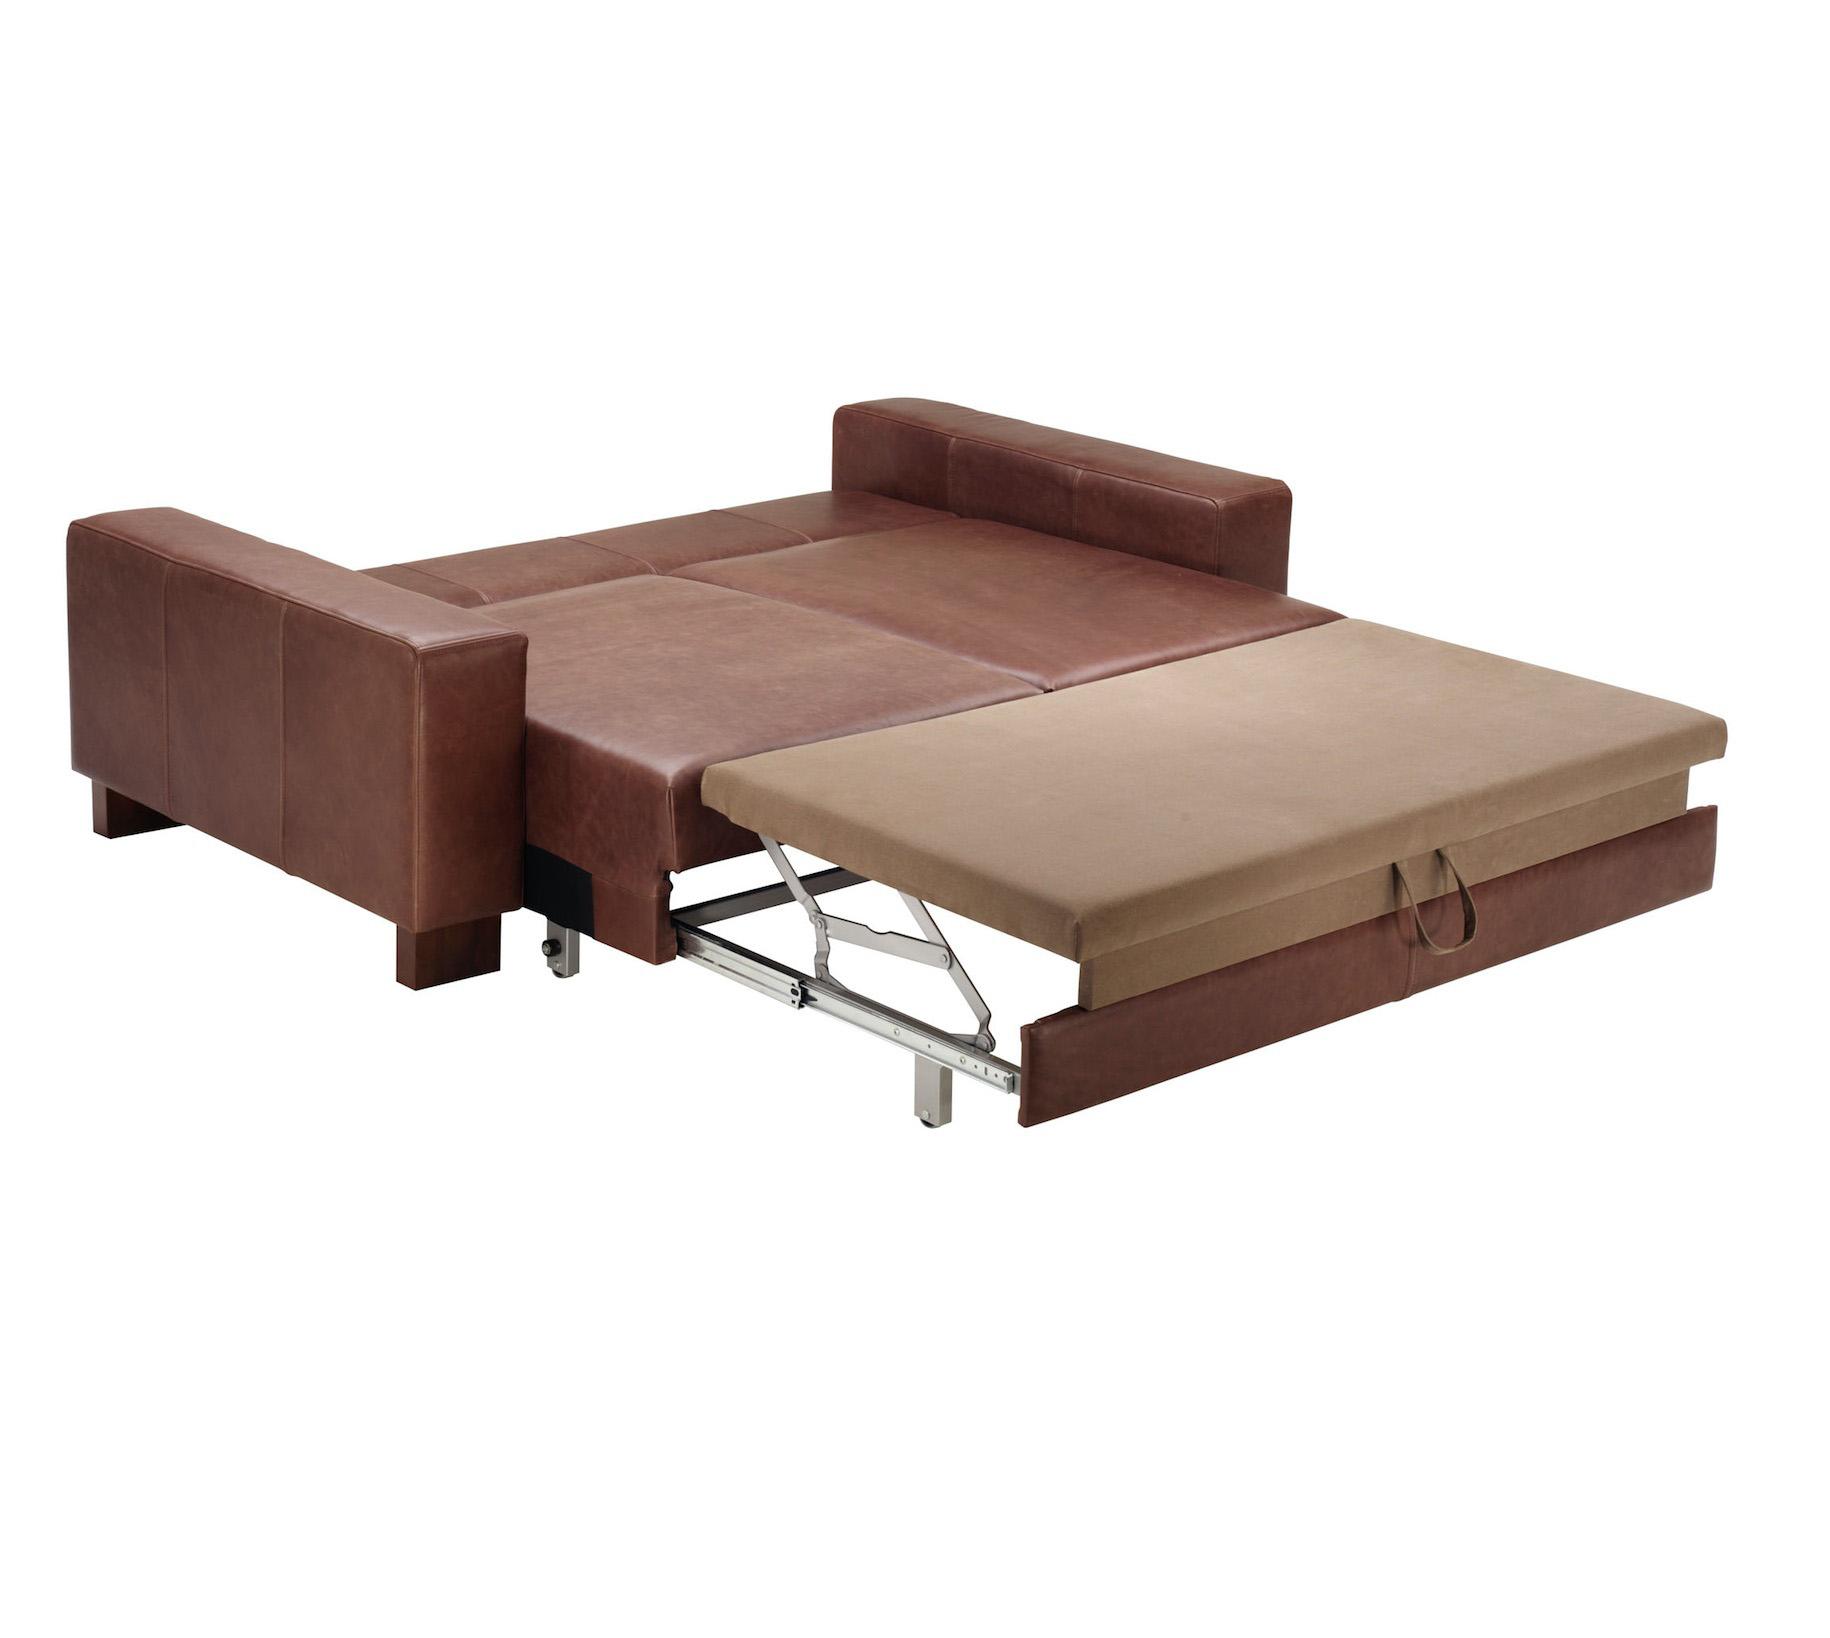 Lantana Italian Leather Sofabed-33749